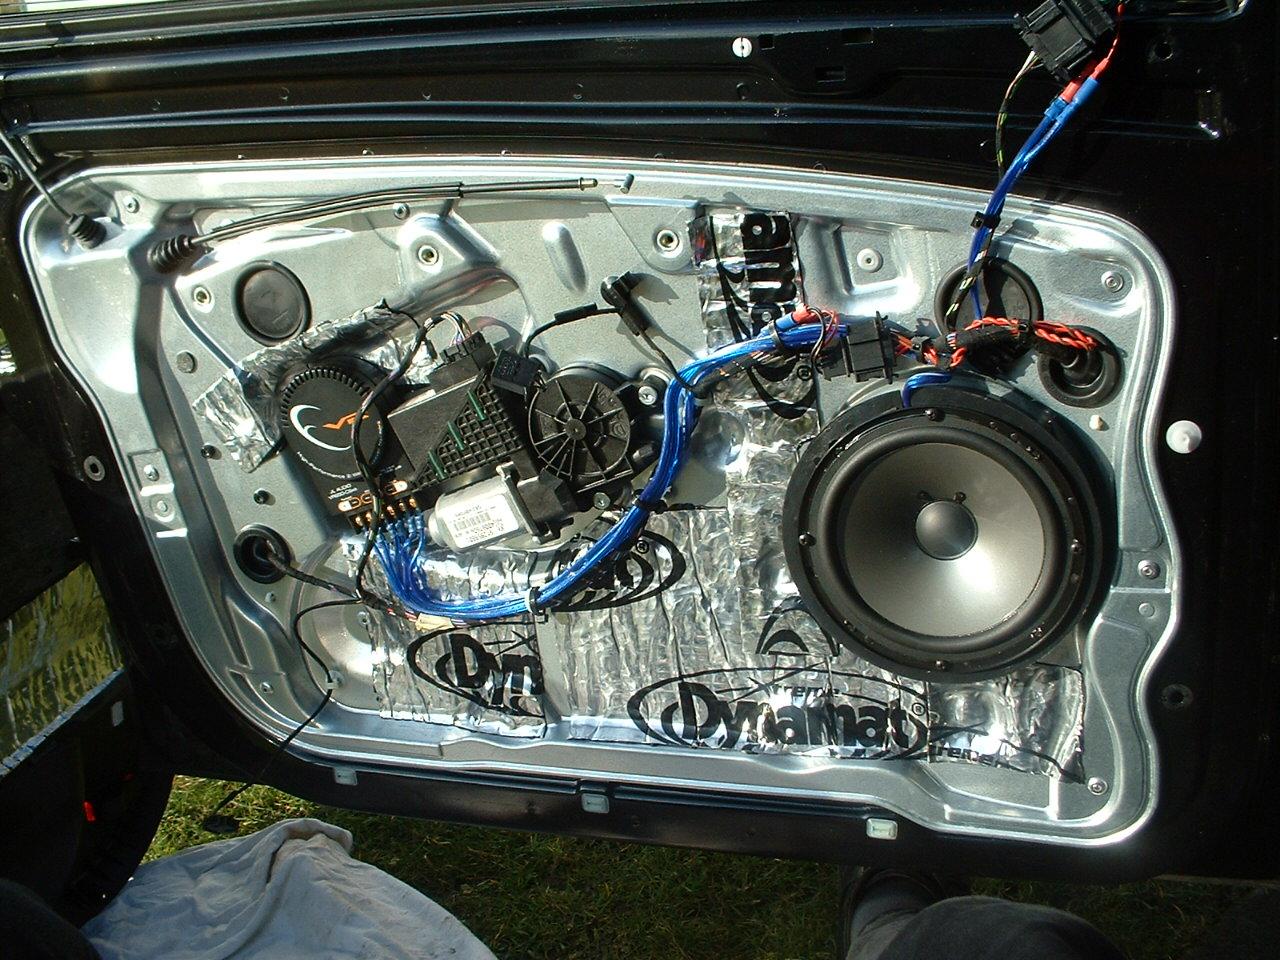 Best Vw Car For Upgrade